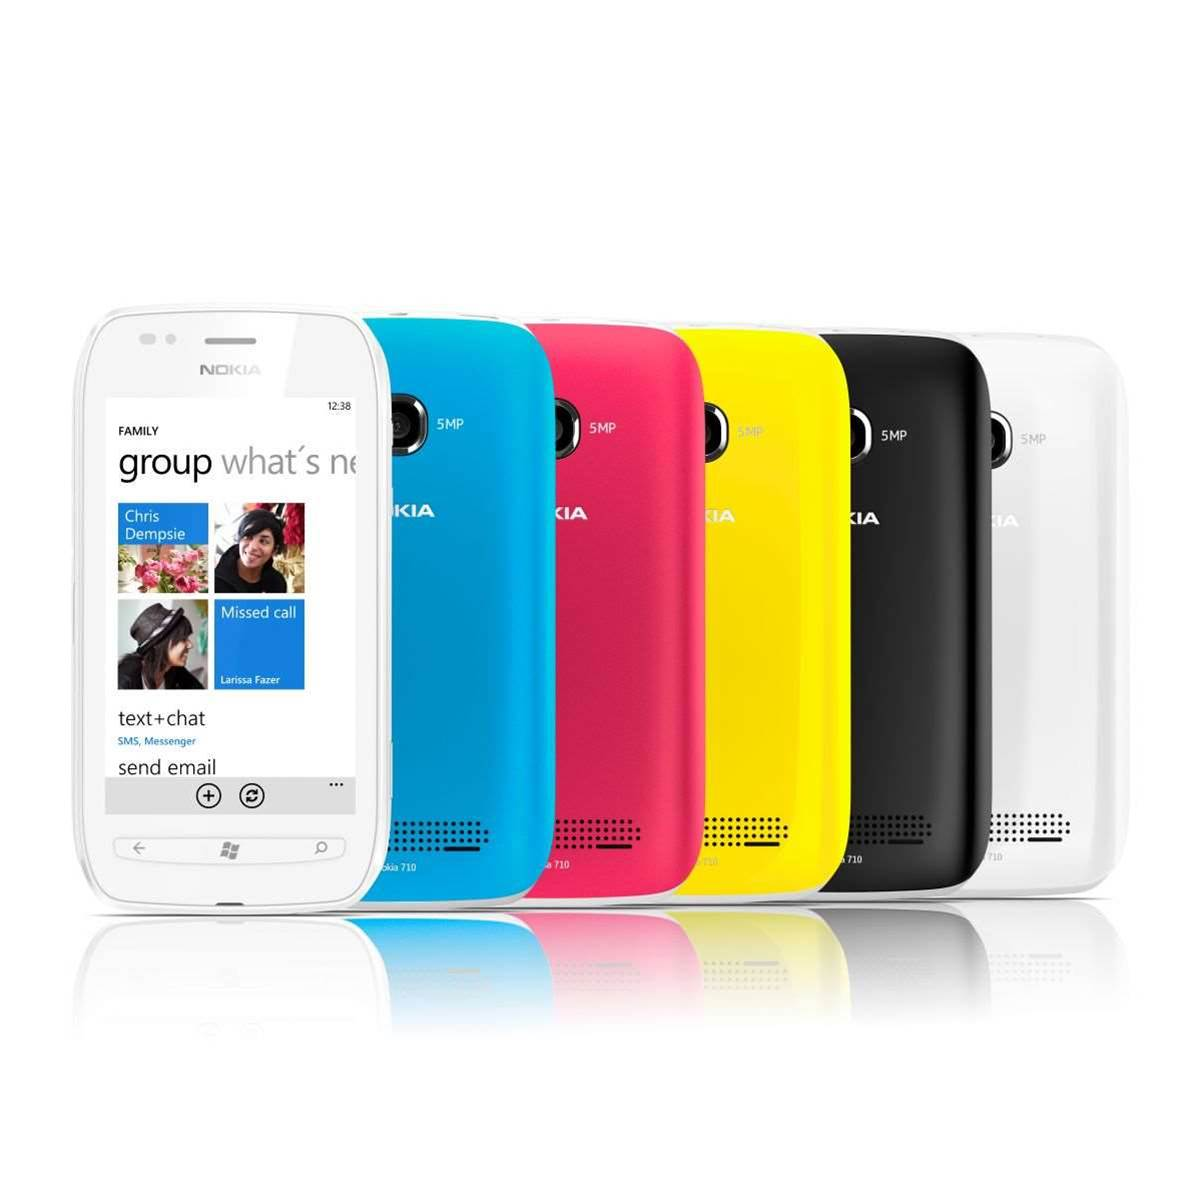 Nokia to unveil cheaper Windows smartphones